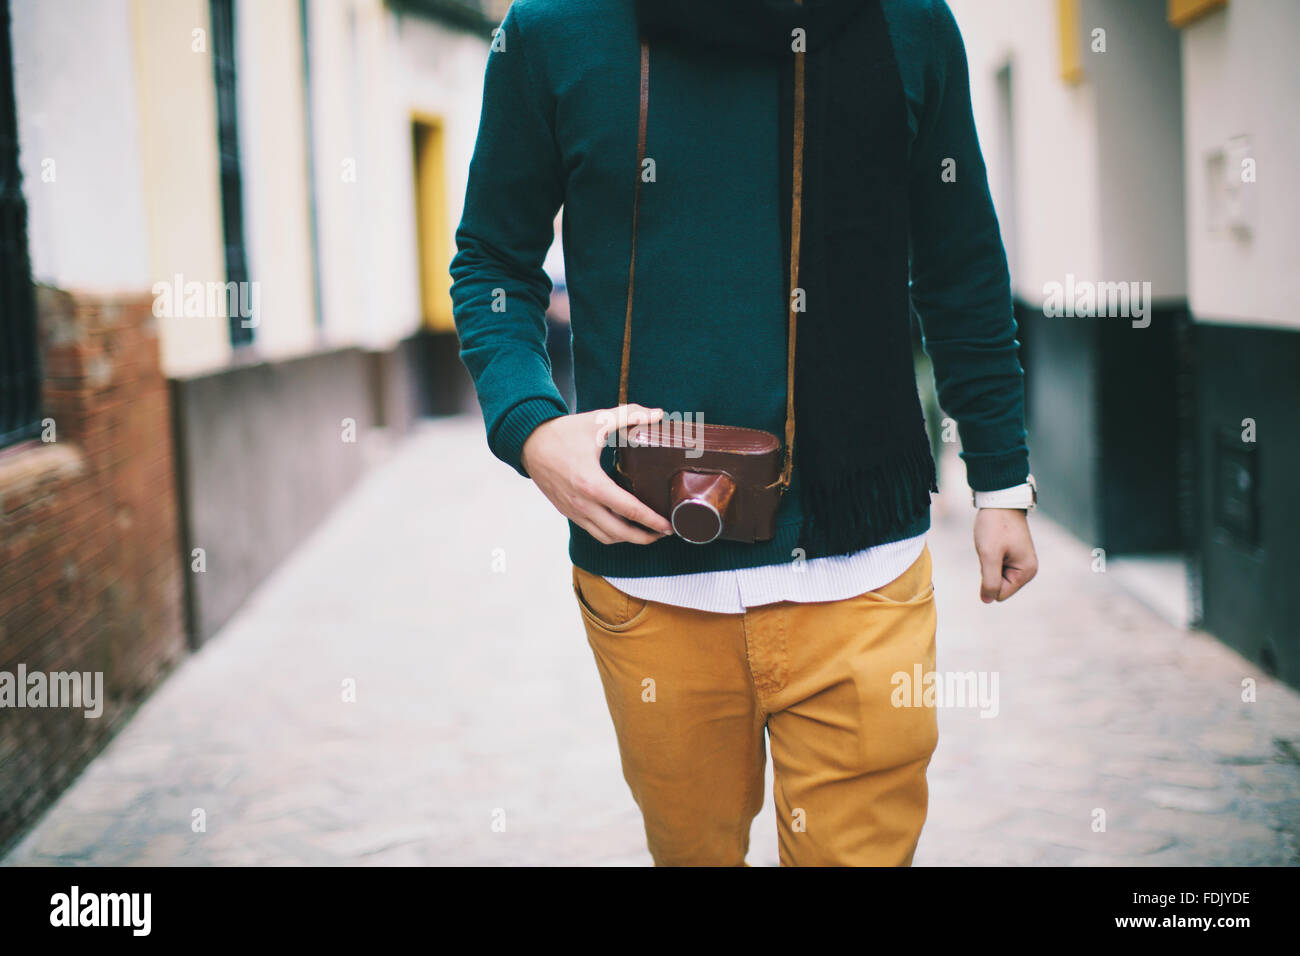 Man Walking down street, holding vintage retro camera, Séville, Espagne Photo Stock